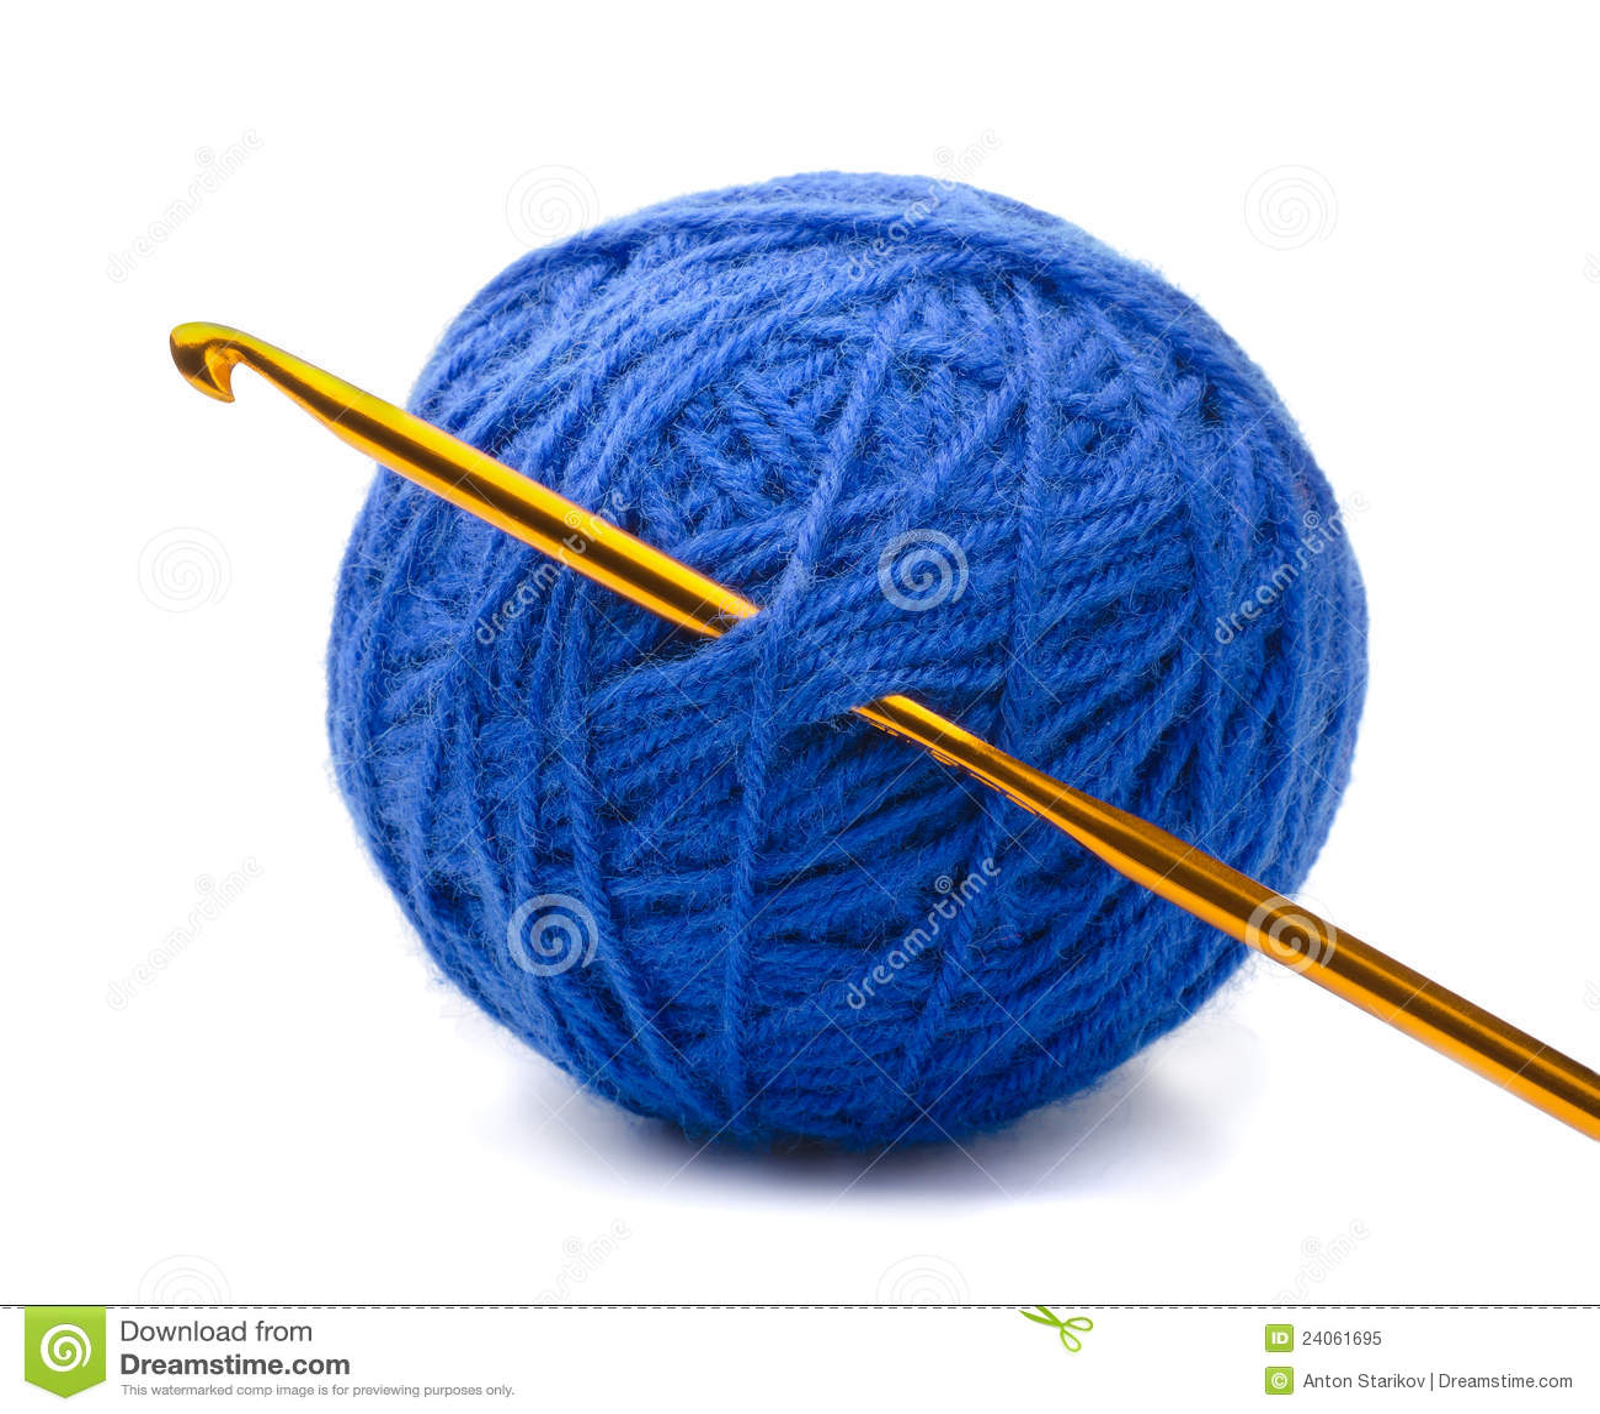 Yarn Crochet : yarn-crochet-hook-24061695.jpg